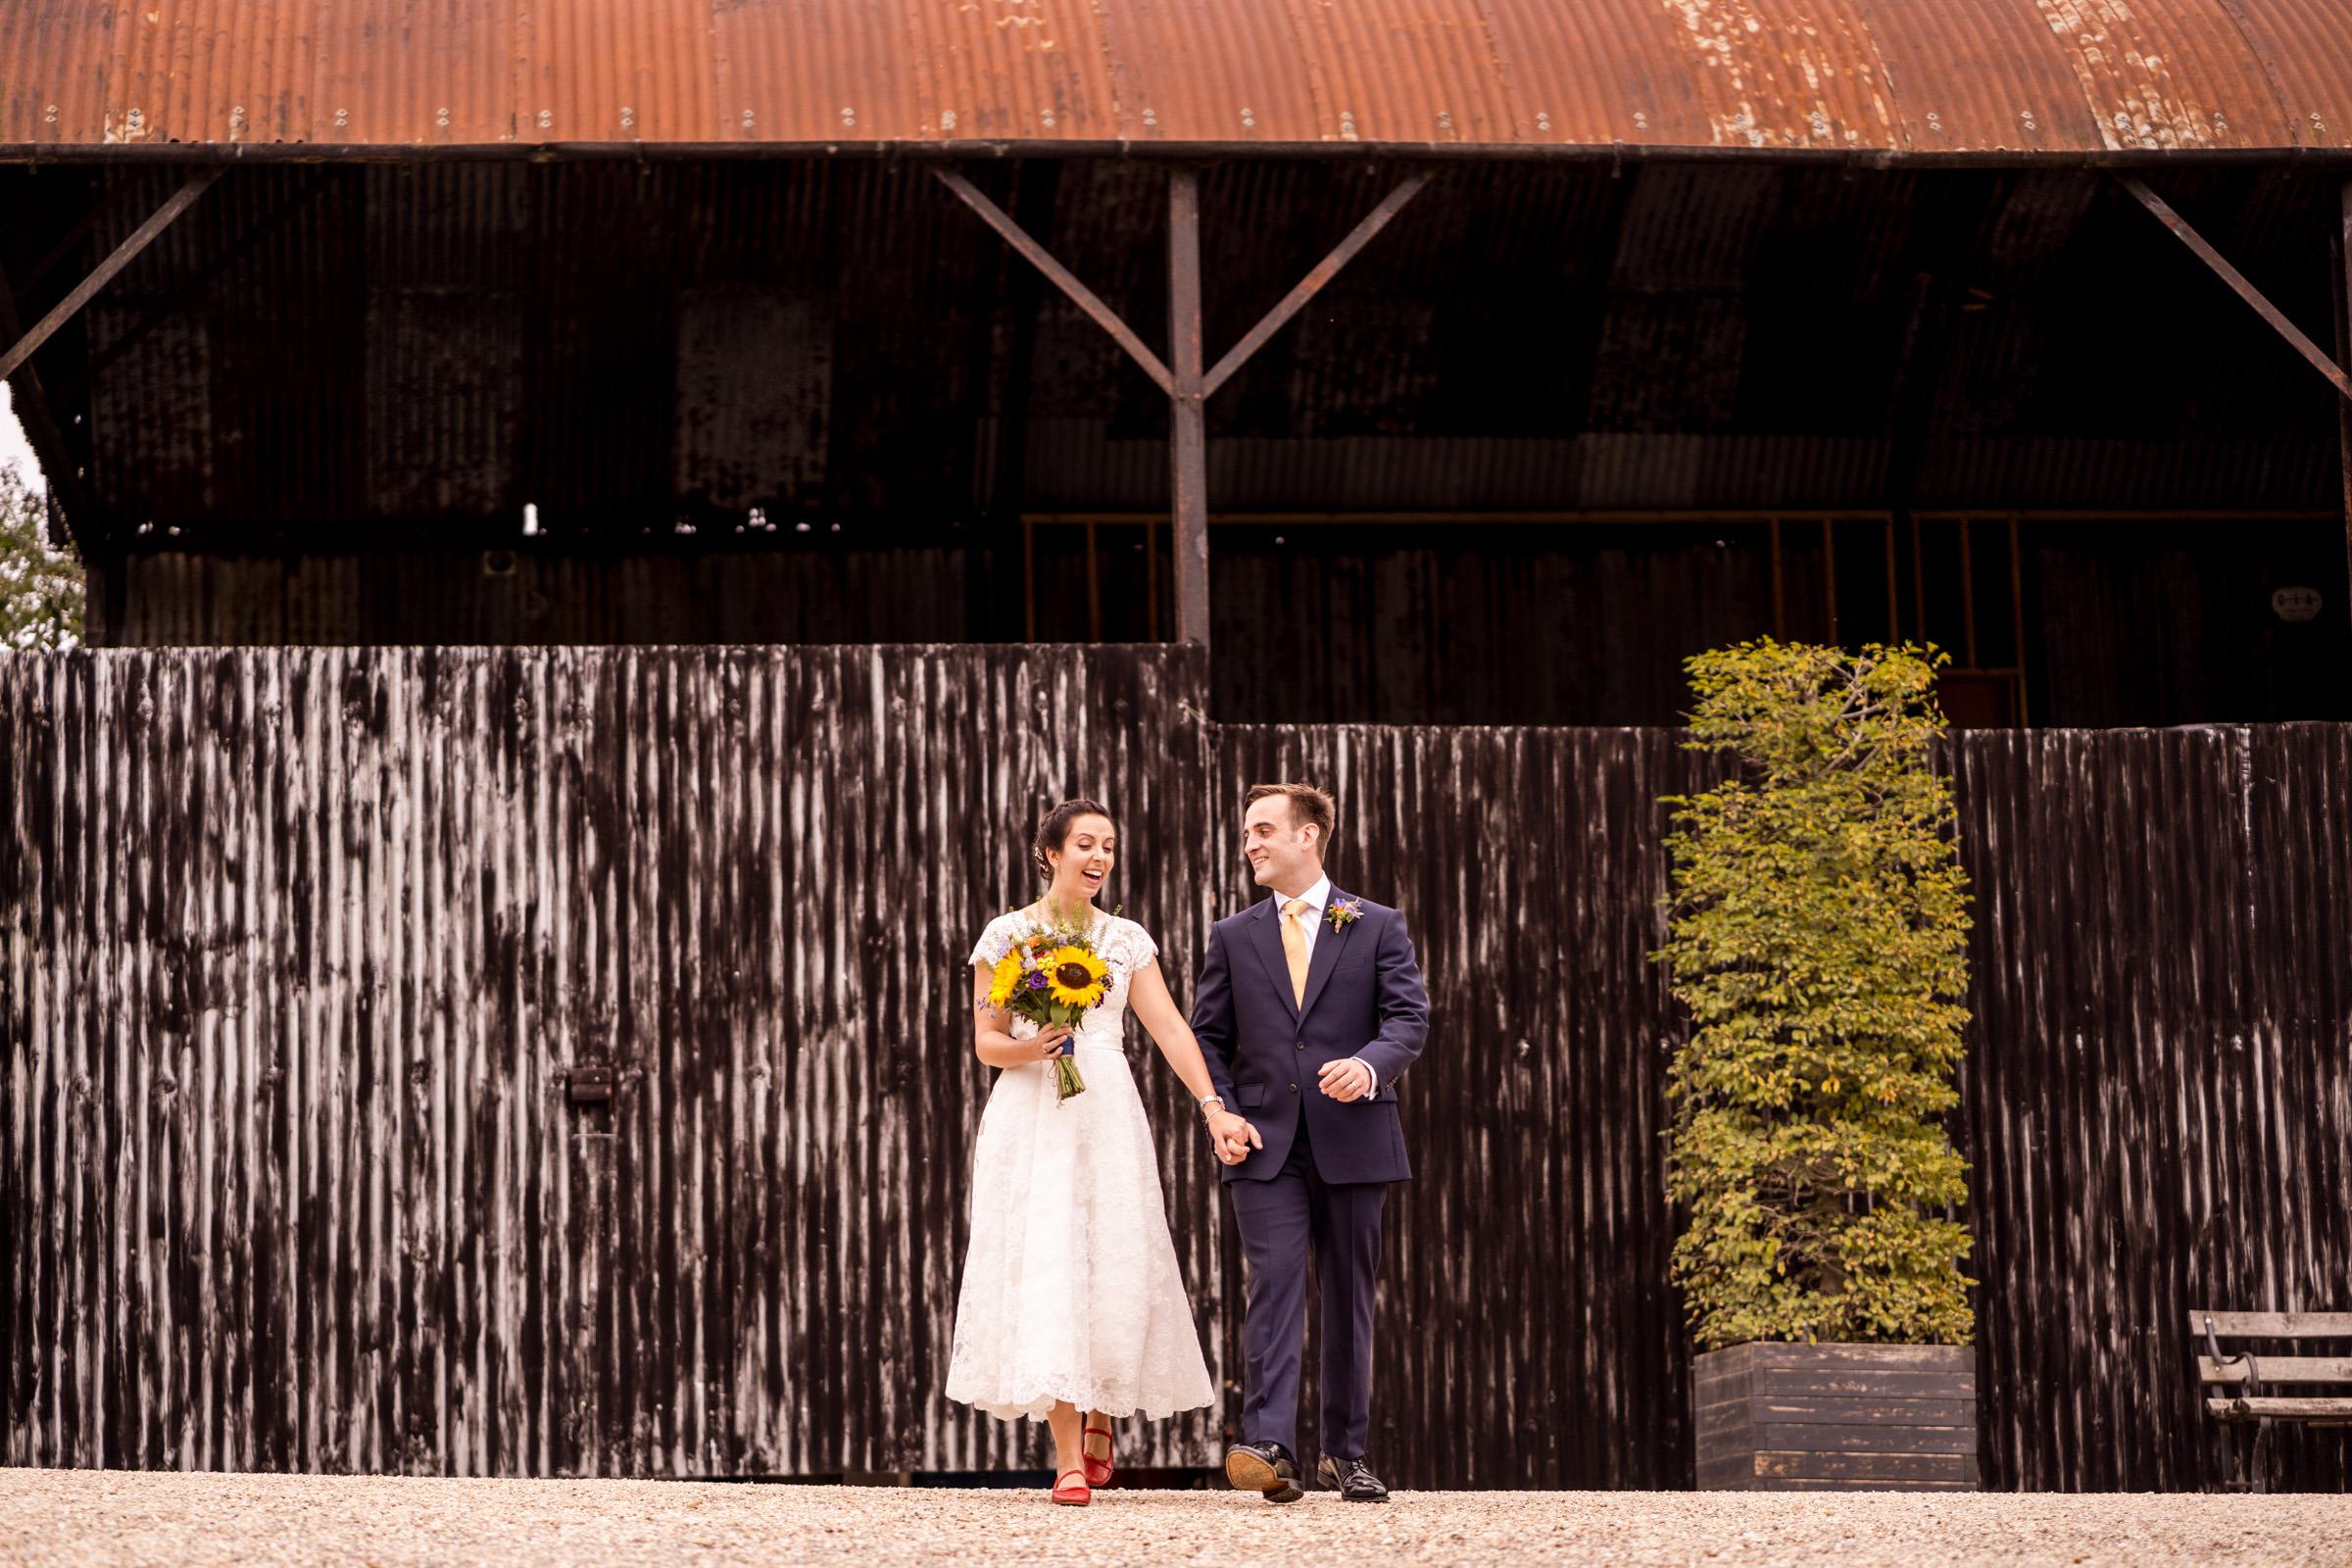 Cripps Barn Bibury Cotswolds Wedding Photography 019.jpg